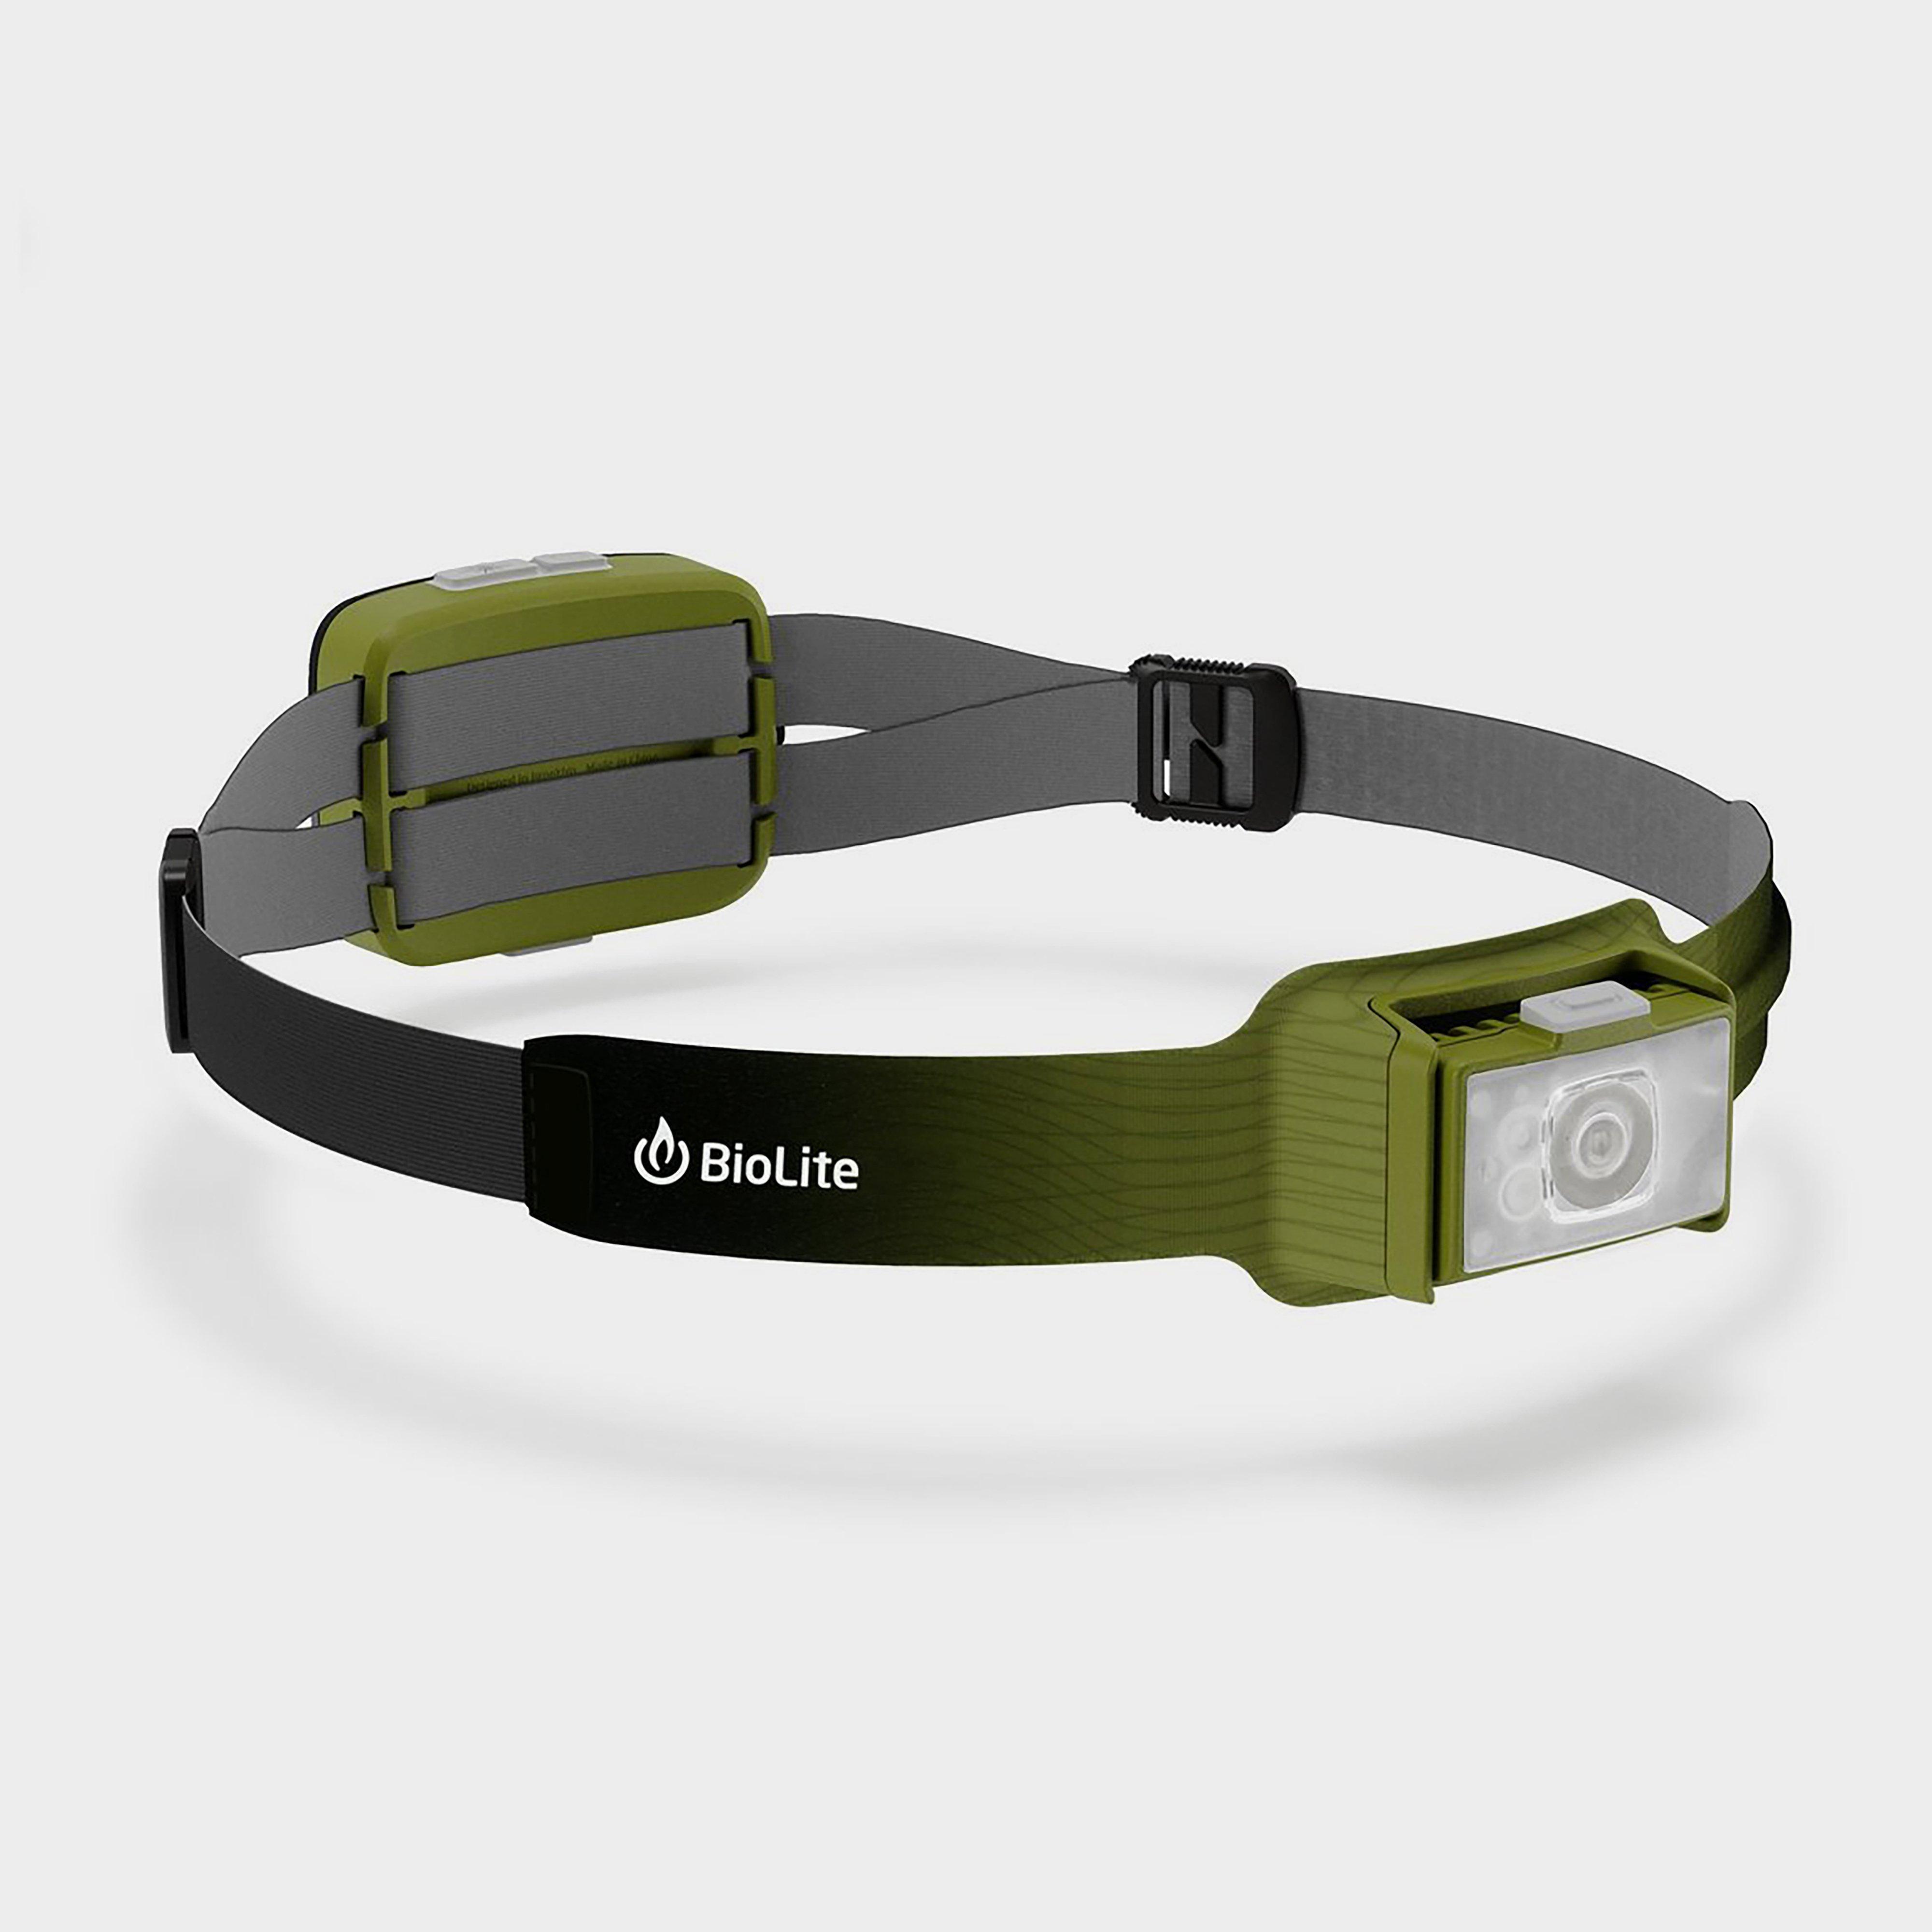 Biolite Headlamp 750 - Green/grn  Green/grn